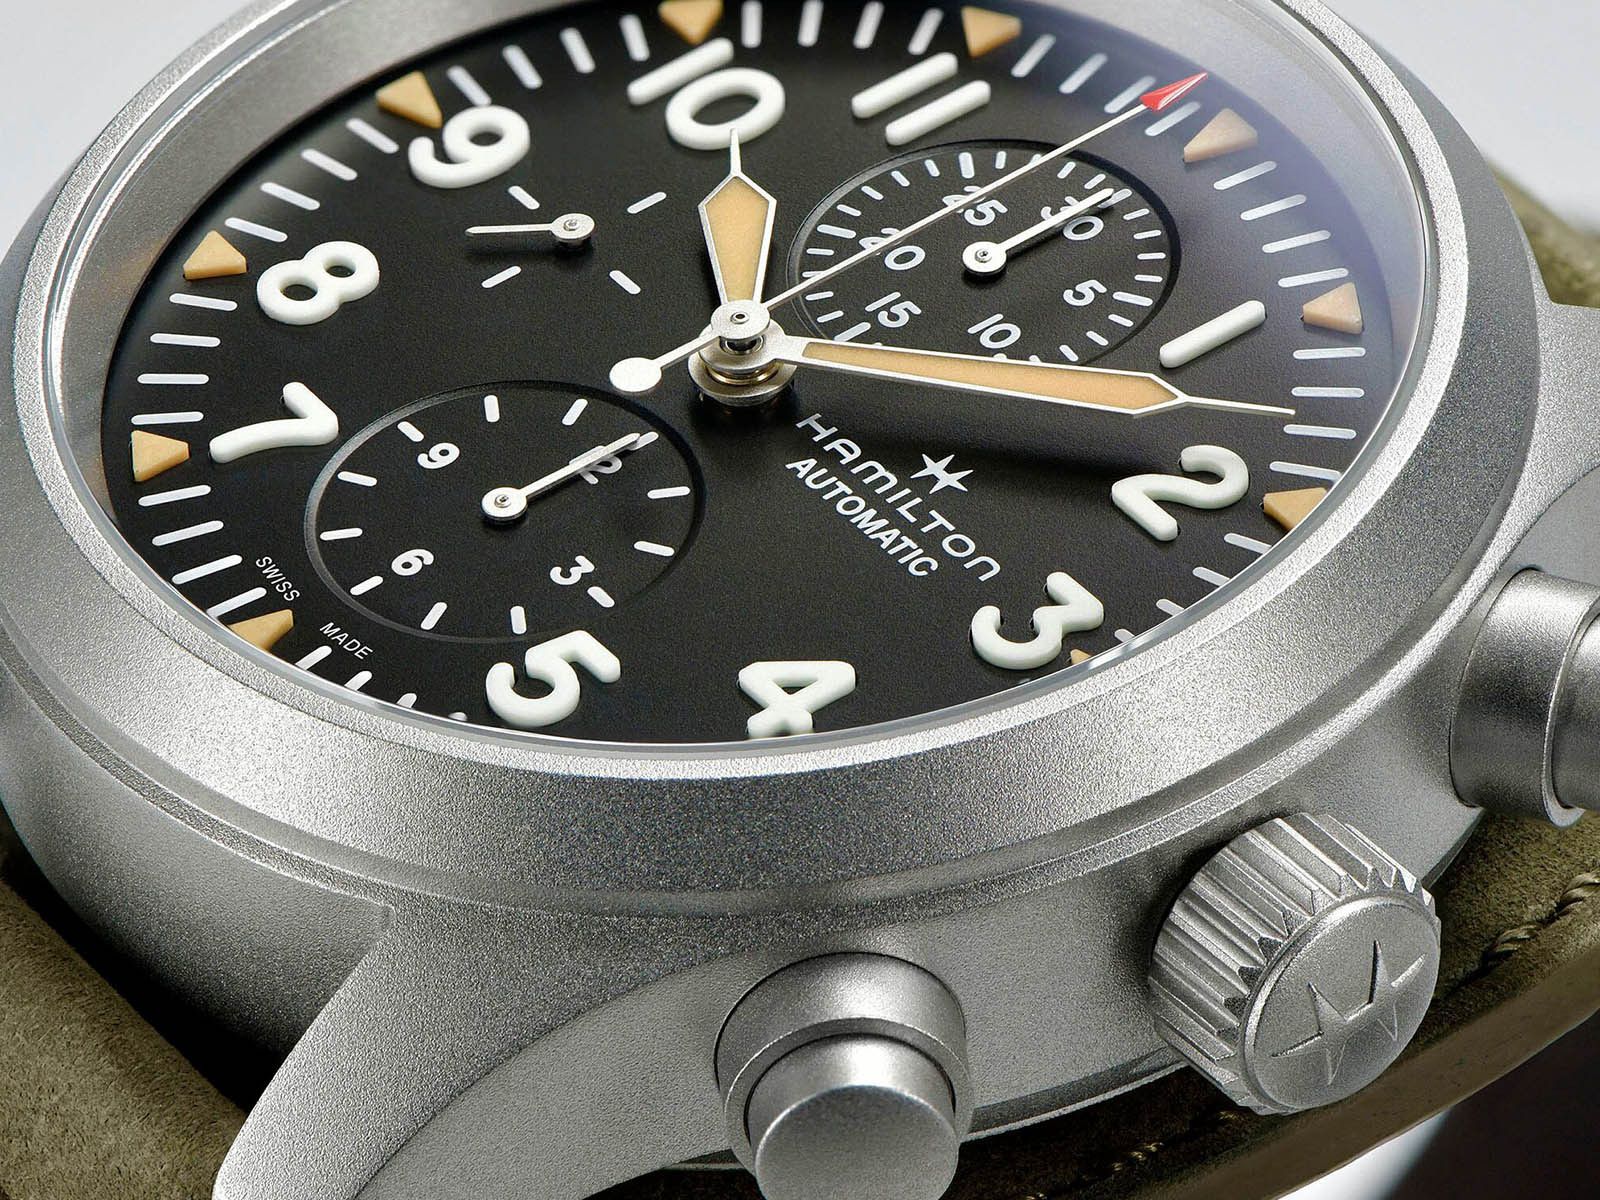 h71706830-hamilton-khaki-field-automatic-chronograph-4.jpg